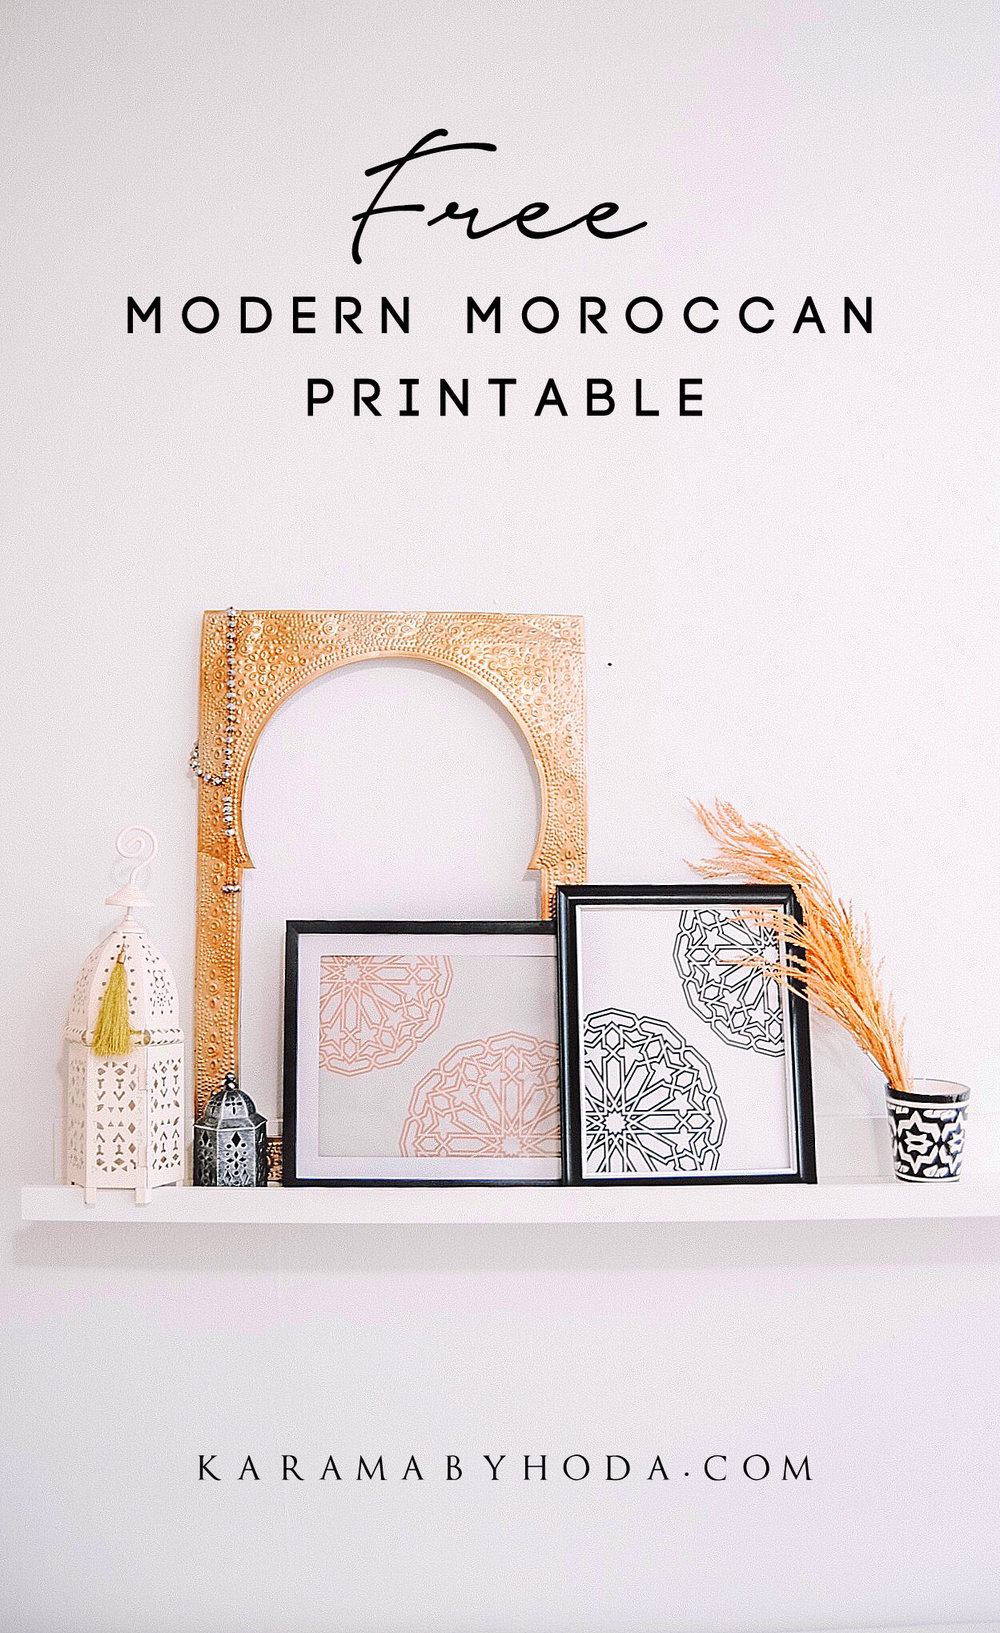 Free Modern Moroccan Printable Wall Art - Karama by Hoda